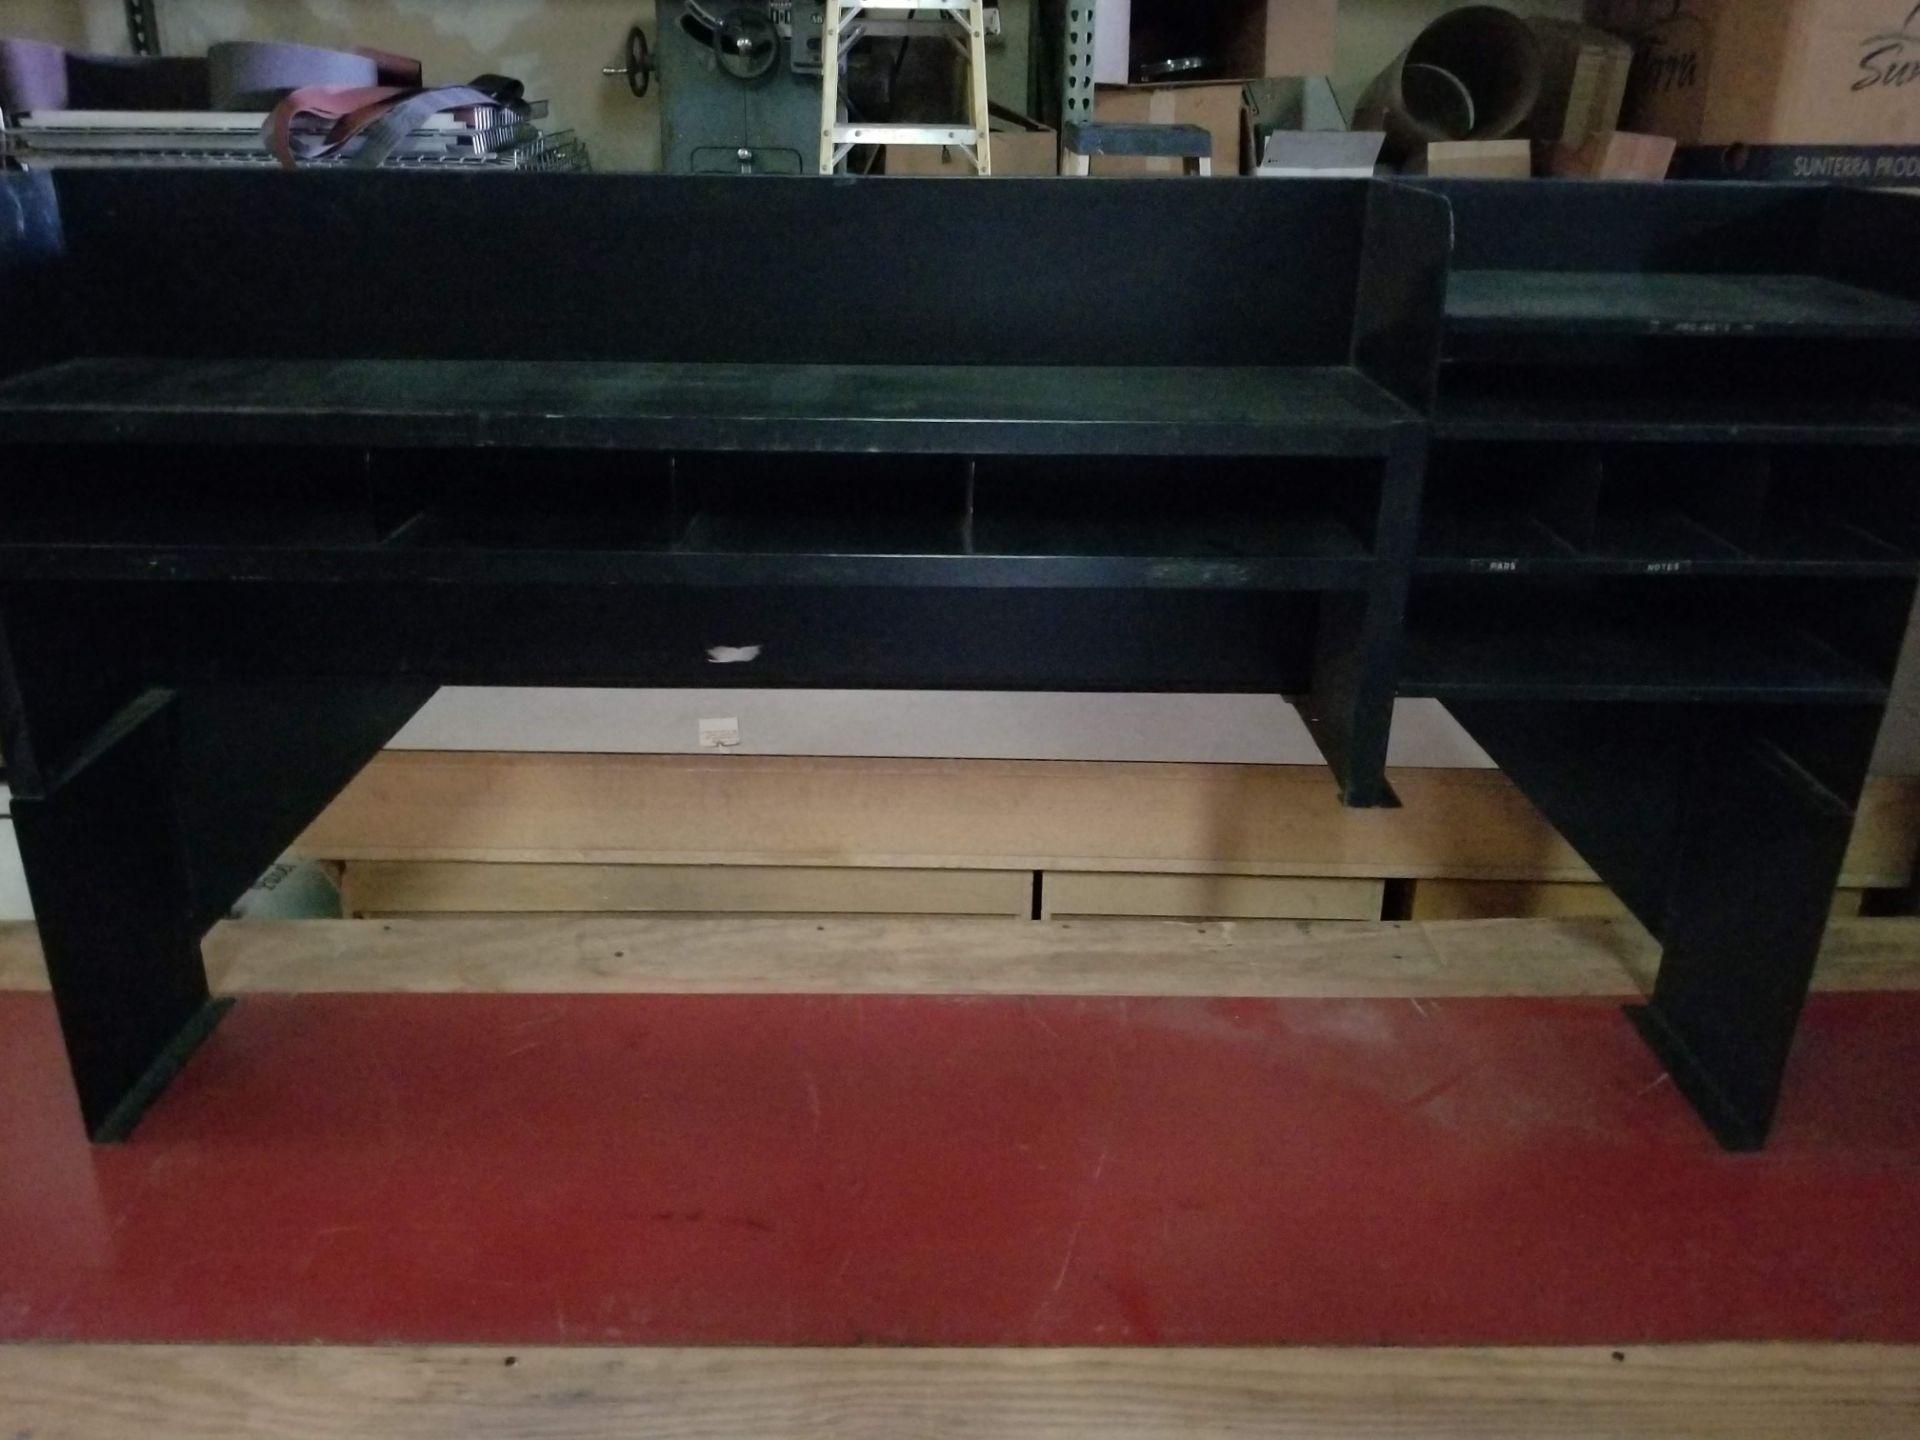 "Lot 56 - Cabinets w/ Plywood Top 93""x30""x36"" & Black Office Storage Hutch"